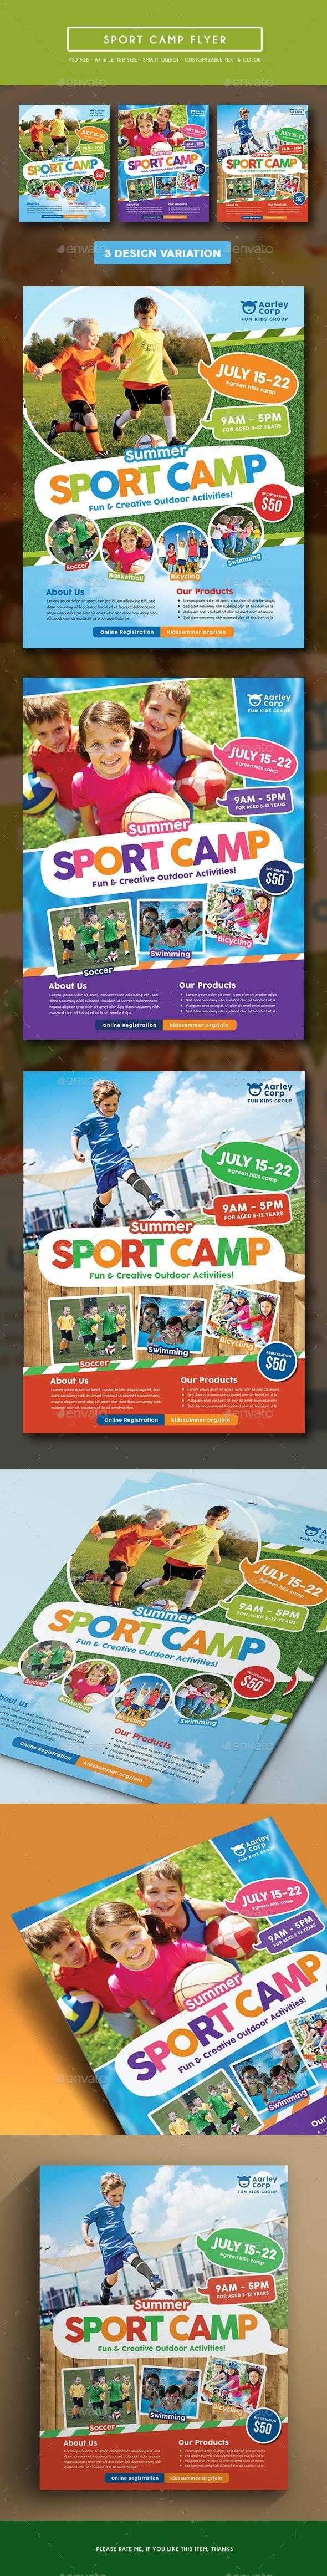 Sport Camp Flyer - Corporate Flyers